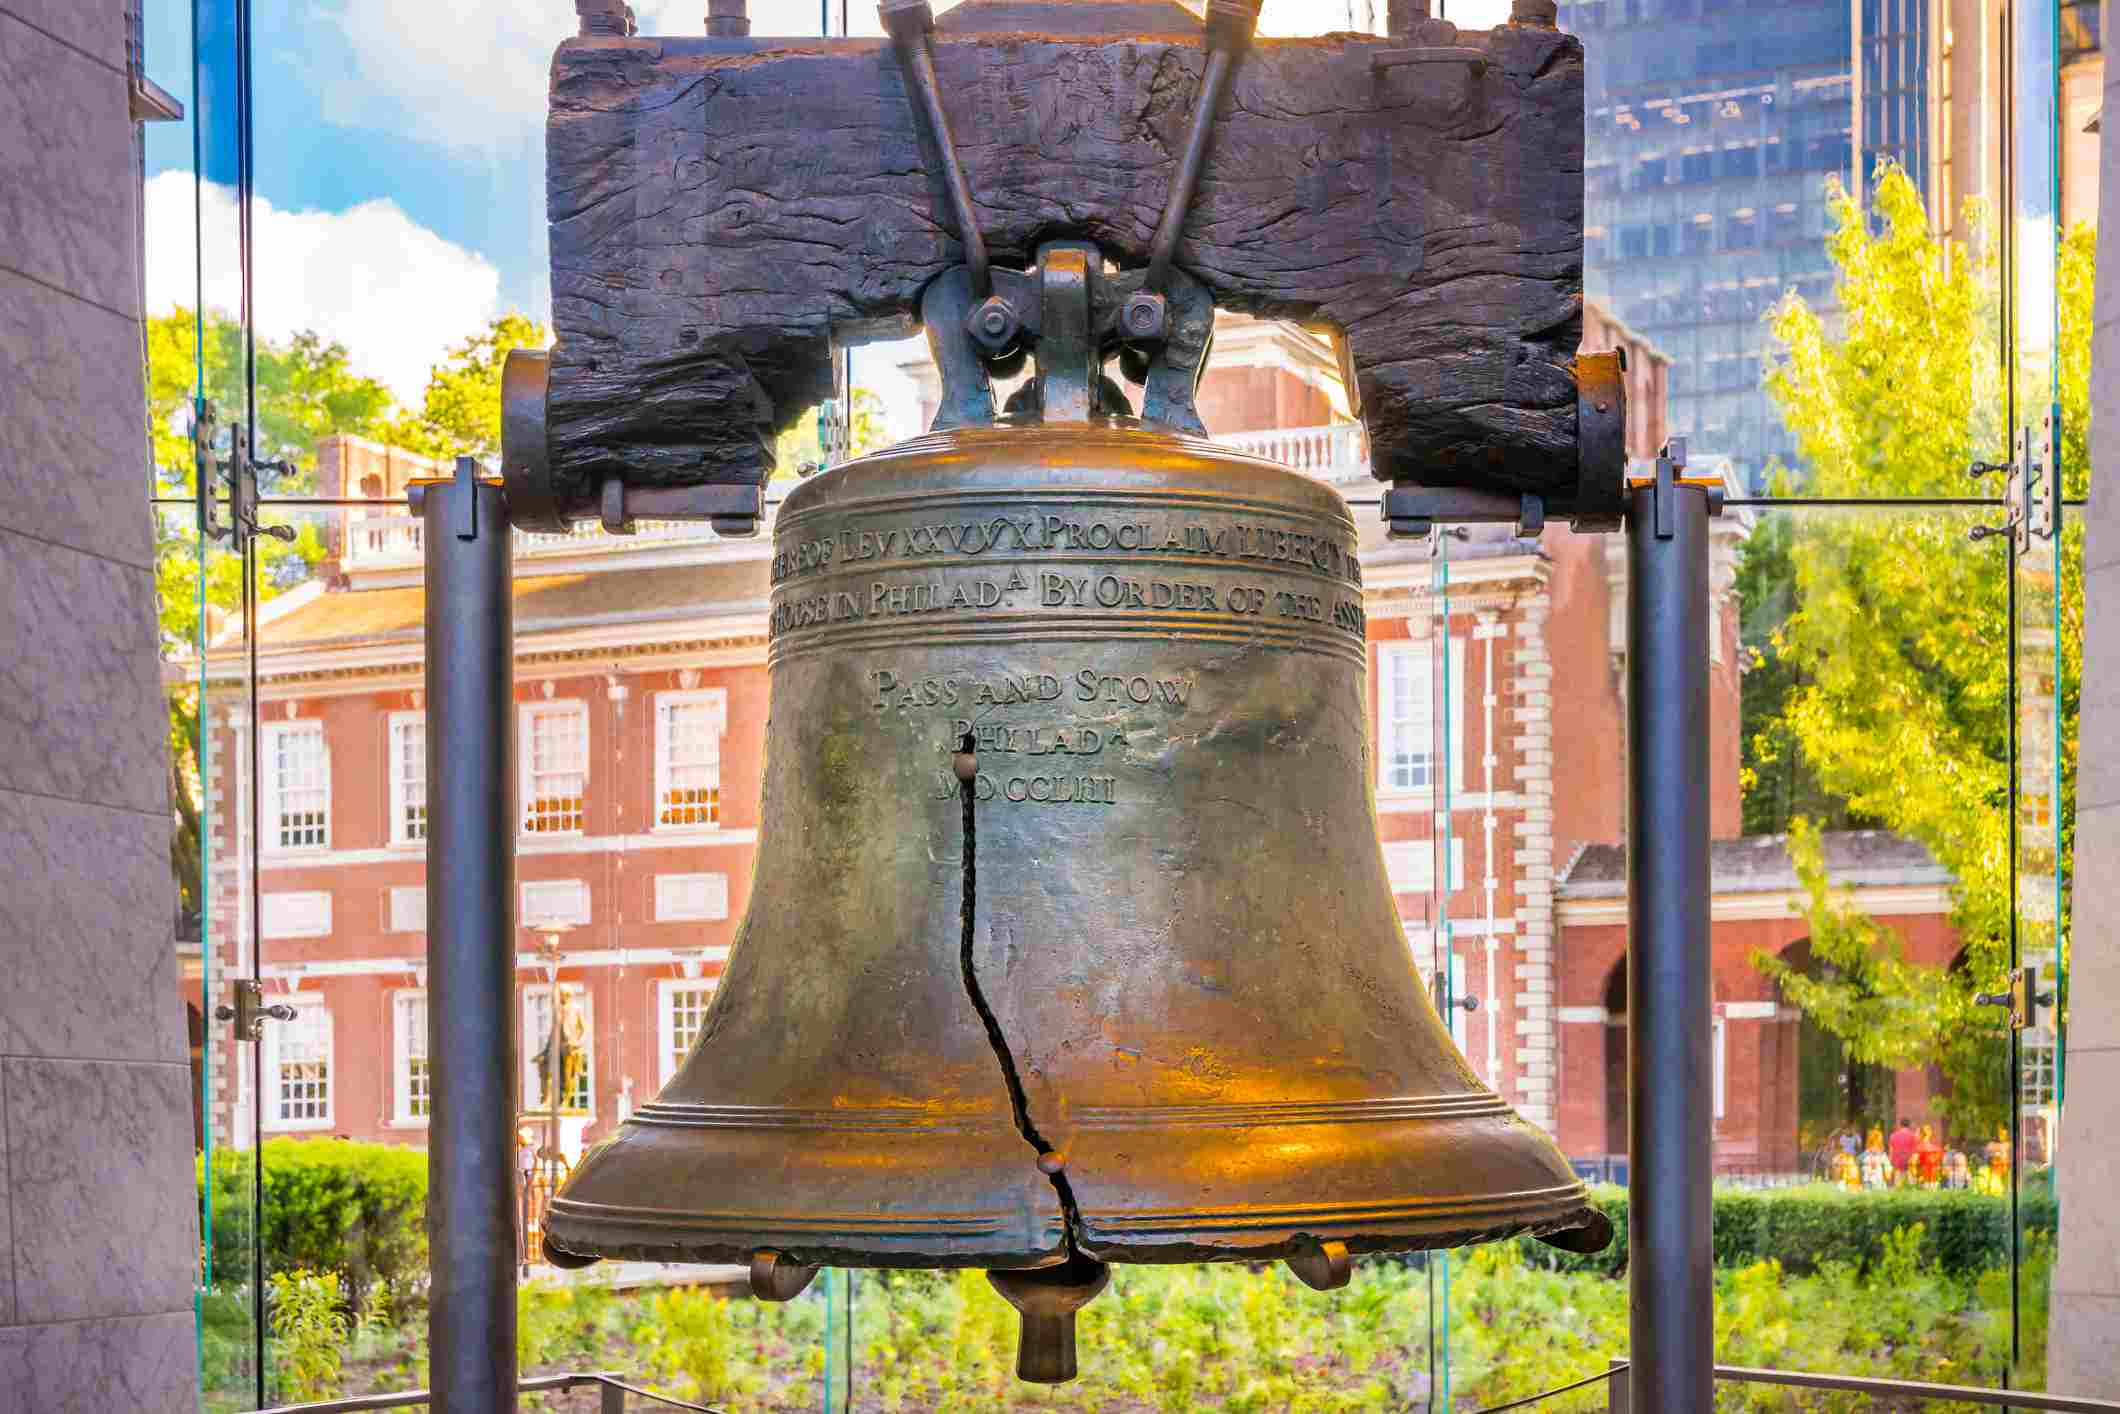 Liberty-Bell-Credit-Tripp-Savvy-JSM-2020